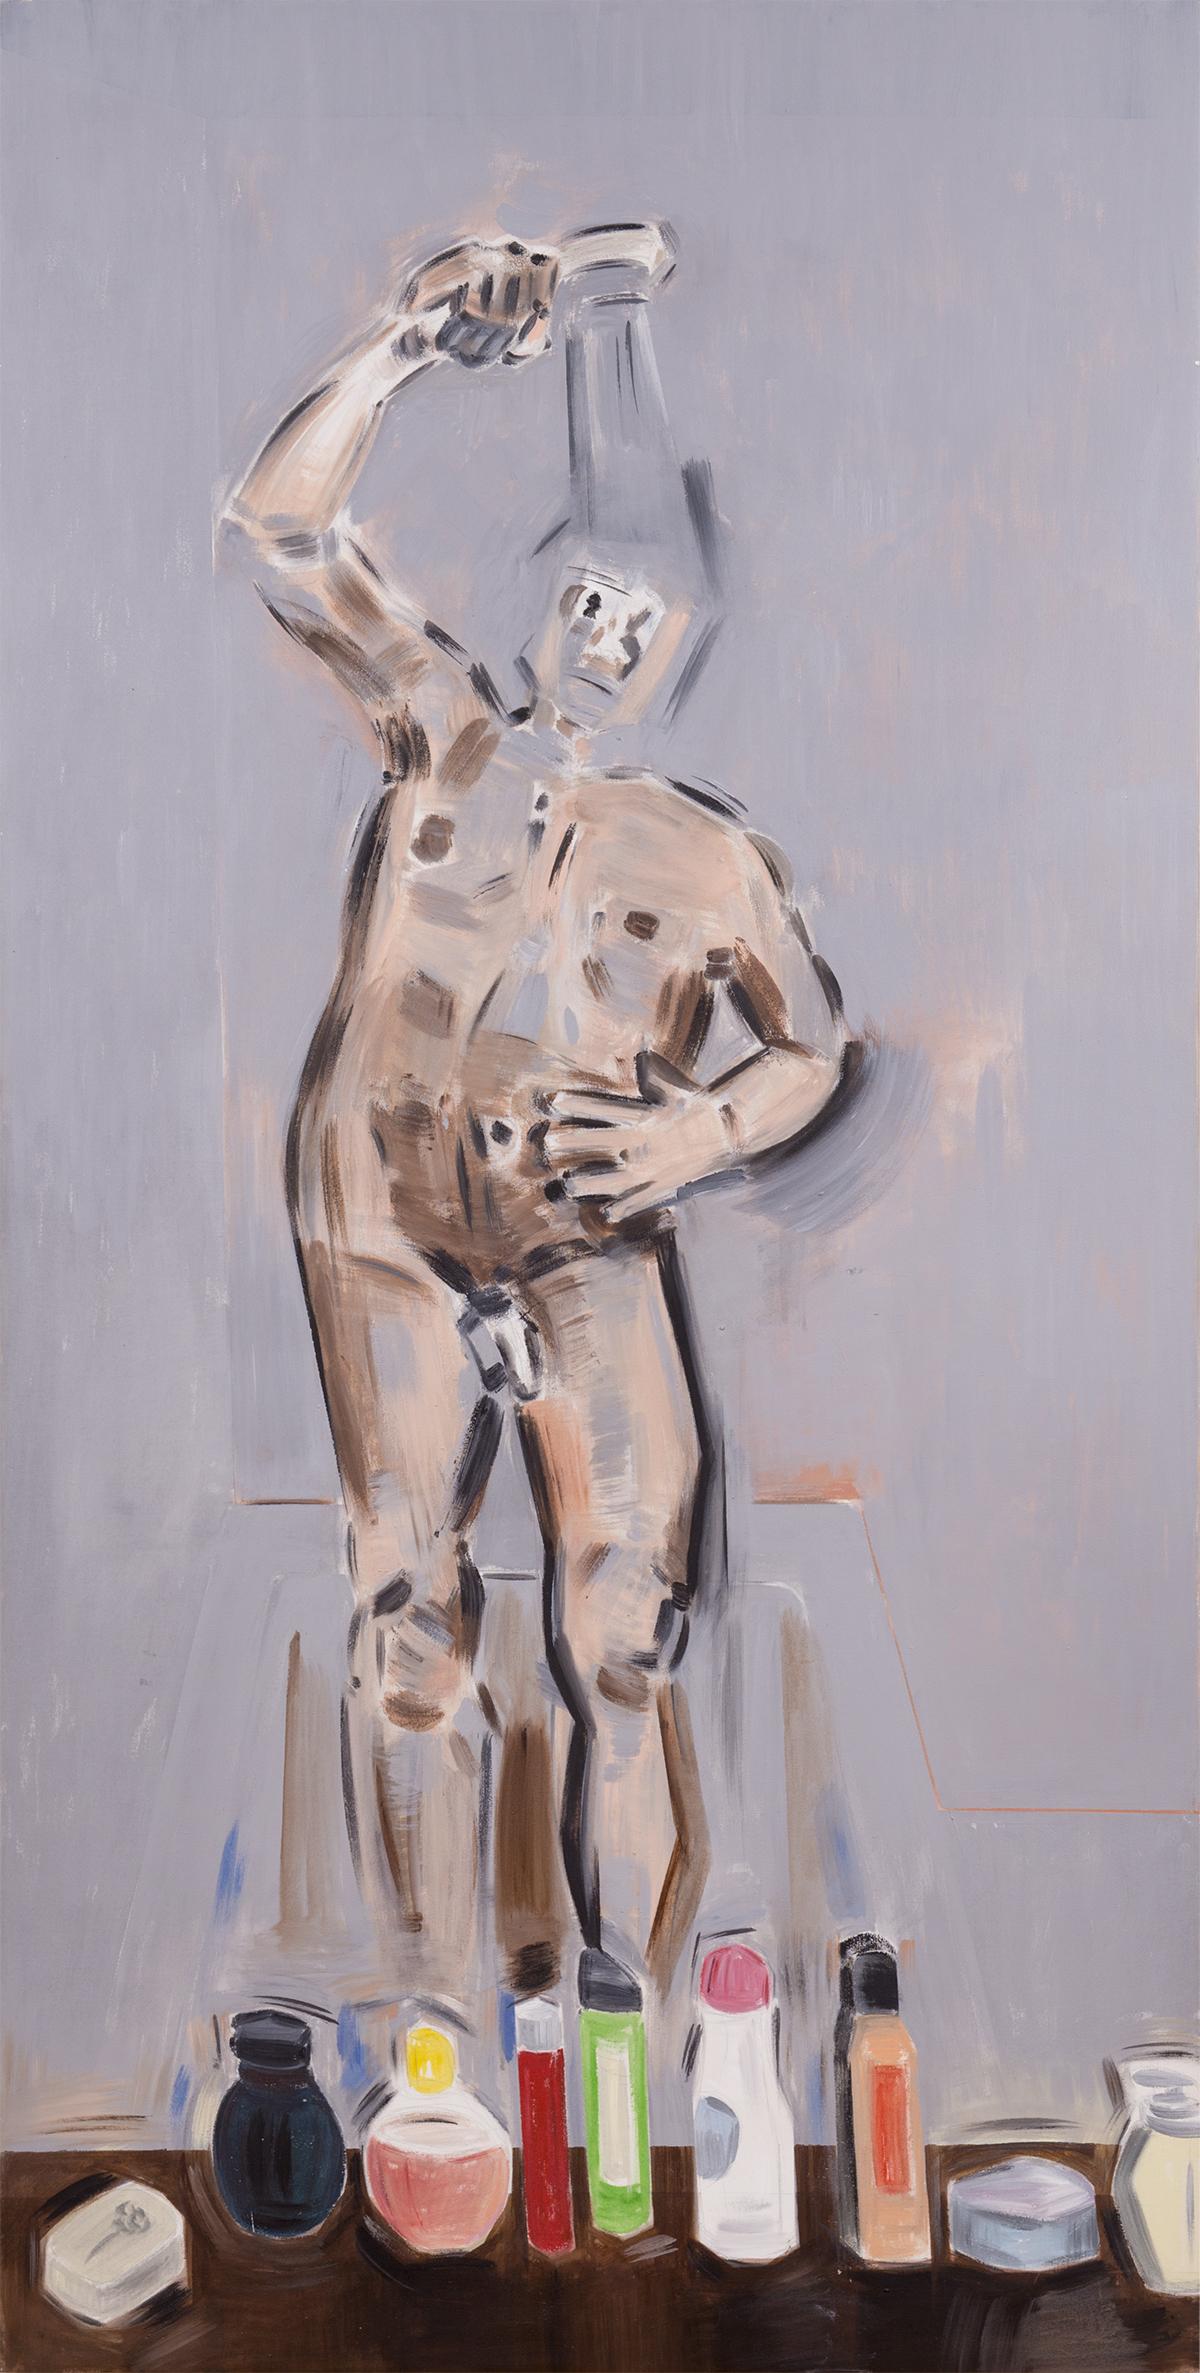 Untitled. Apostolos Georgiou. 2014 Acrylic on canvas. 78.5 x 39.5 inches